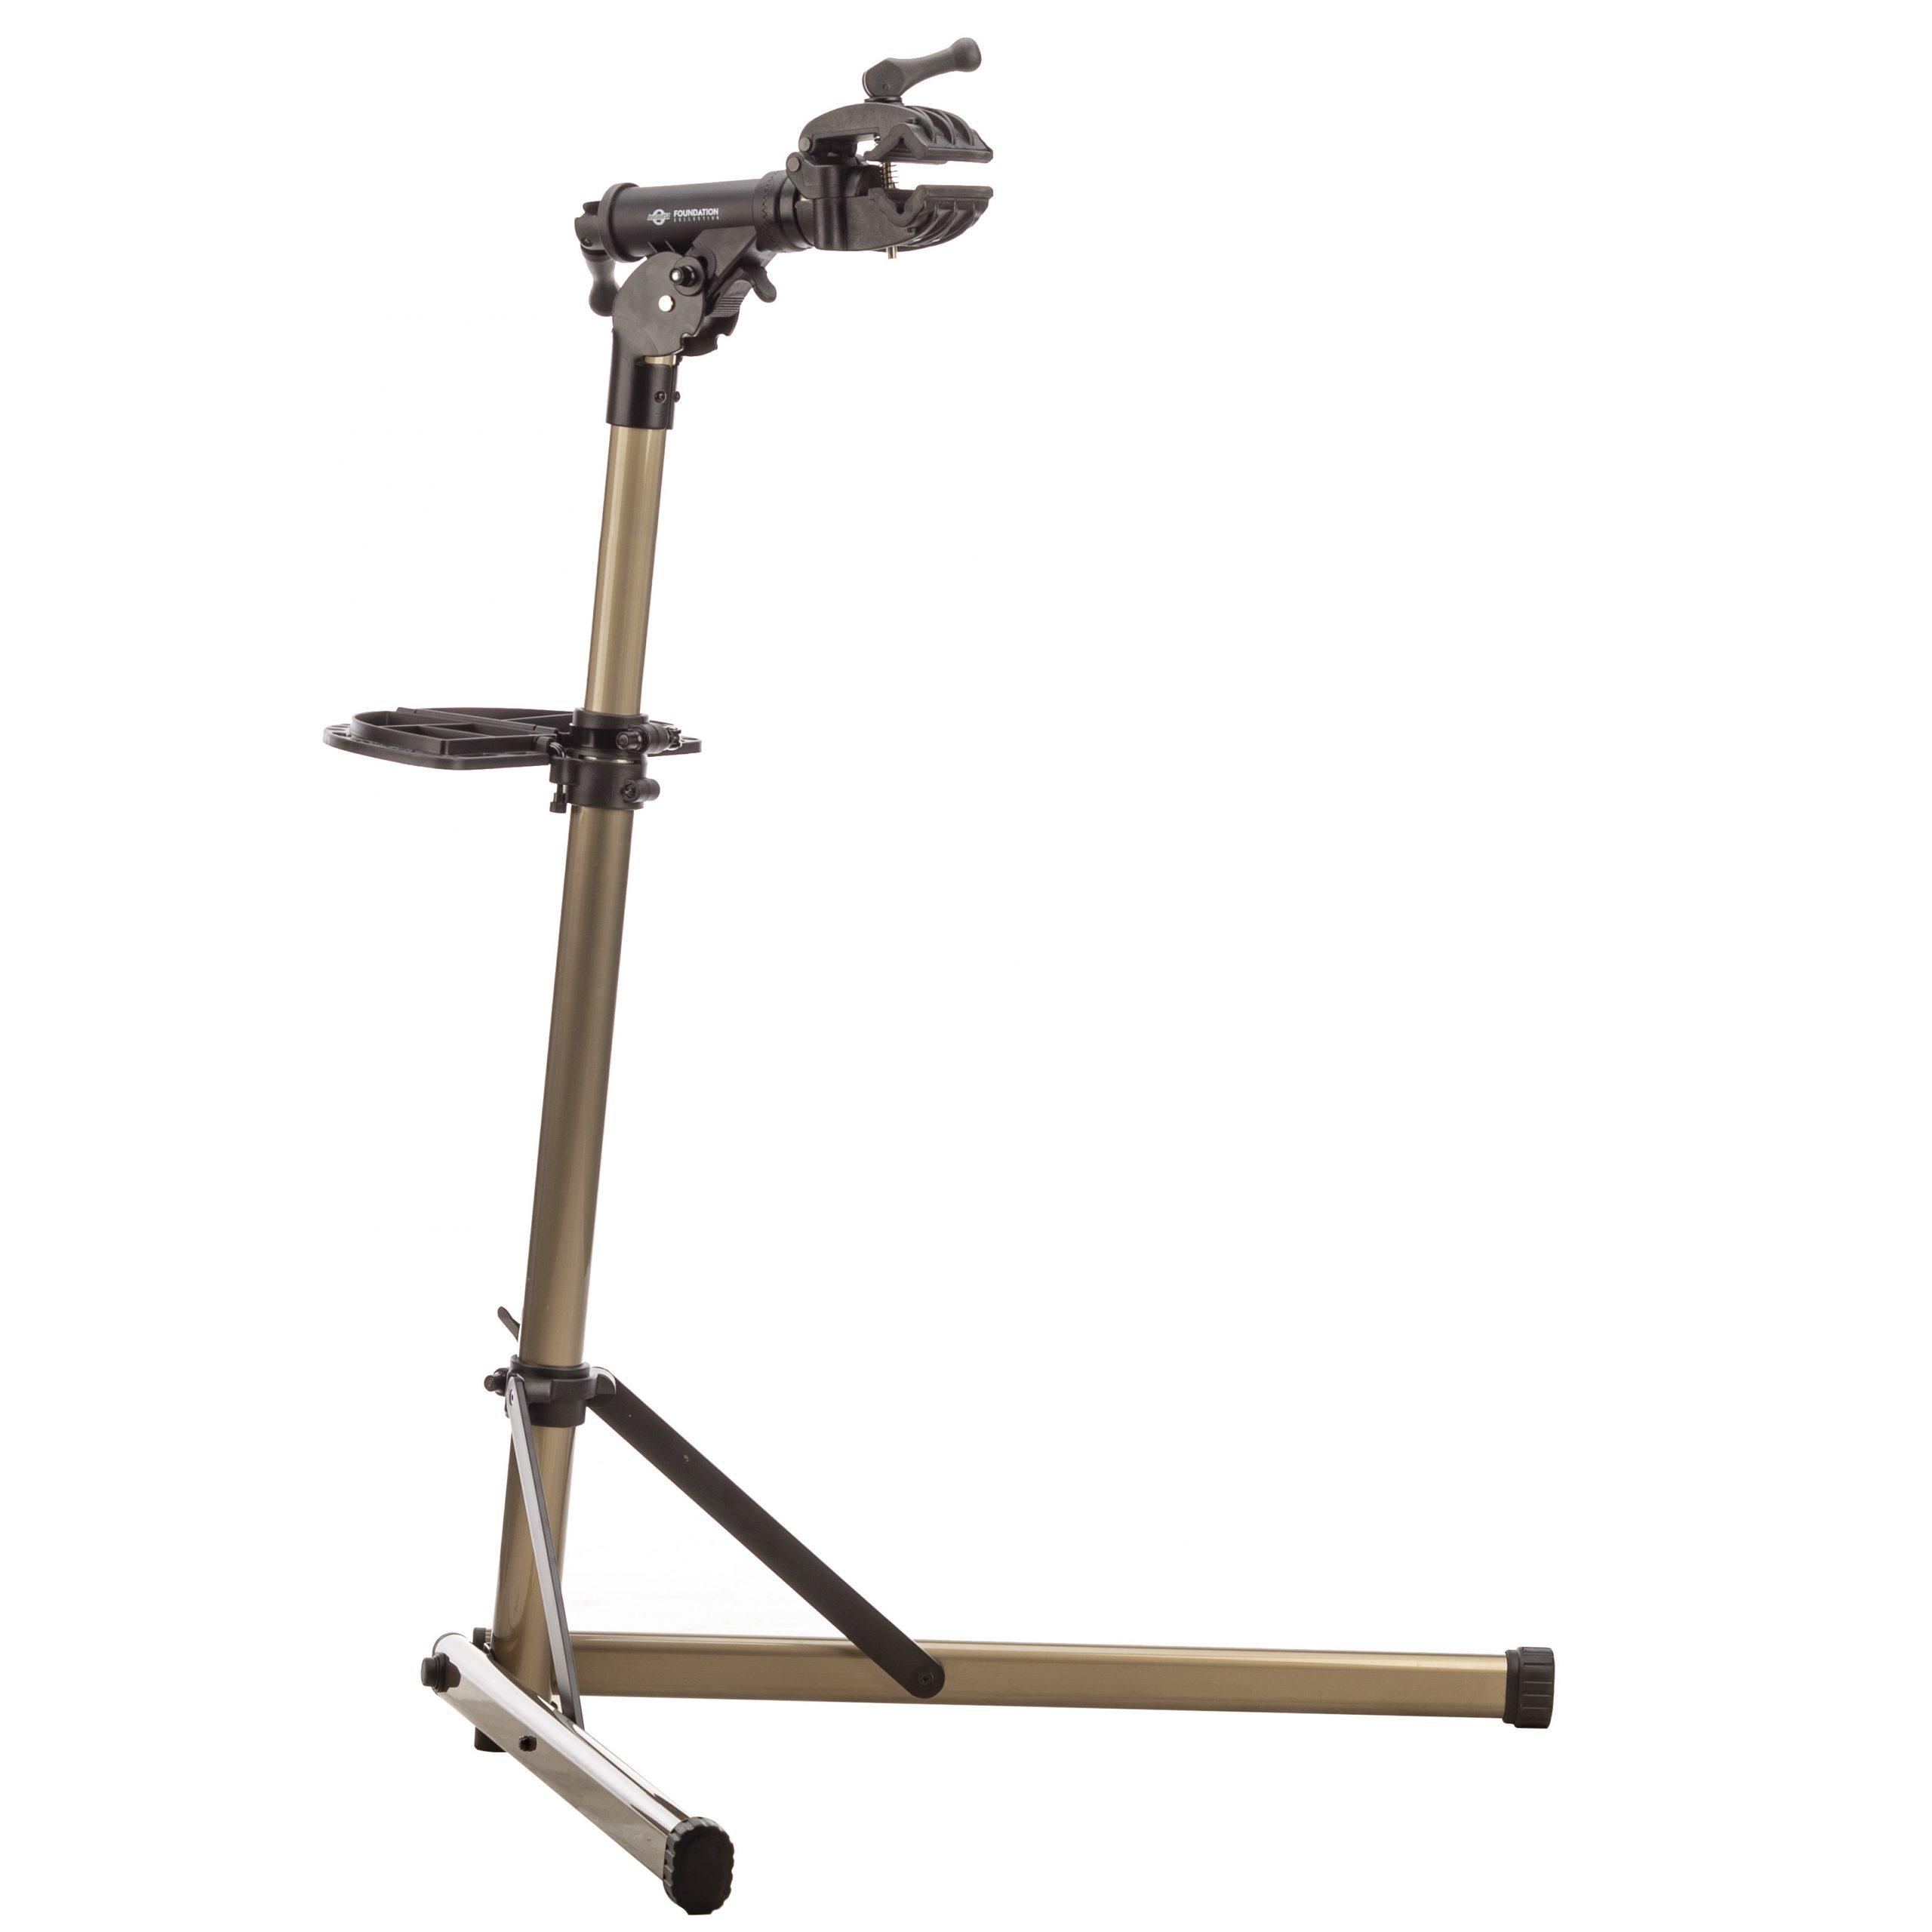 Foundation Bike Stand